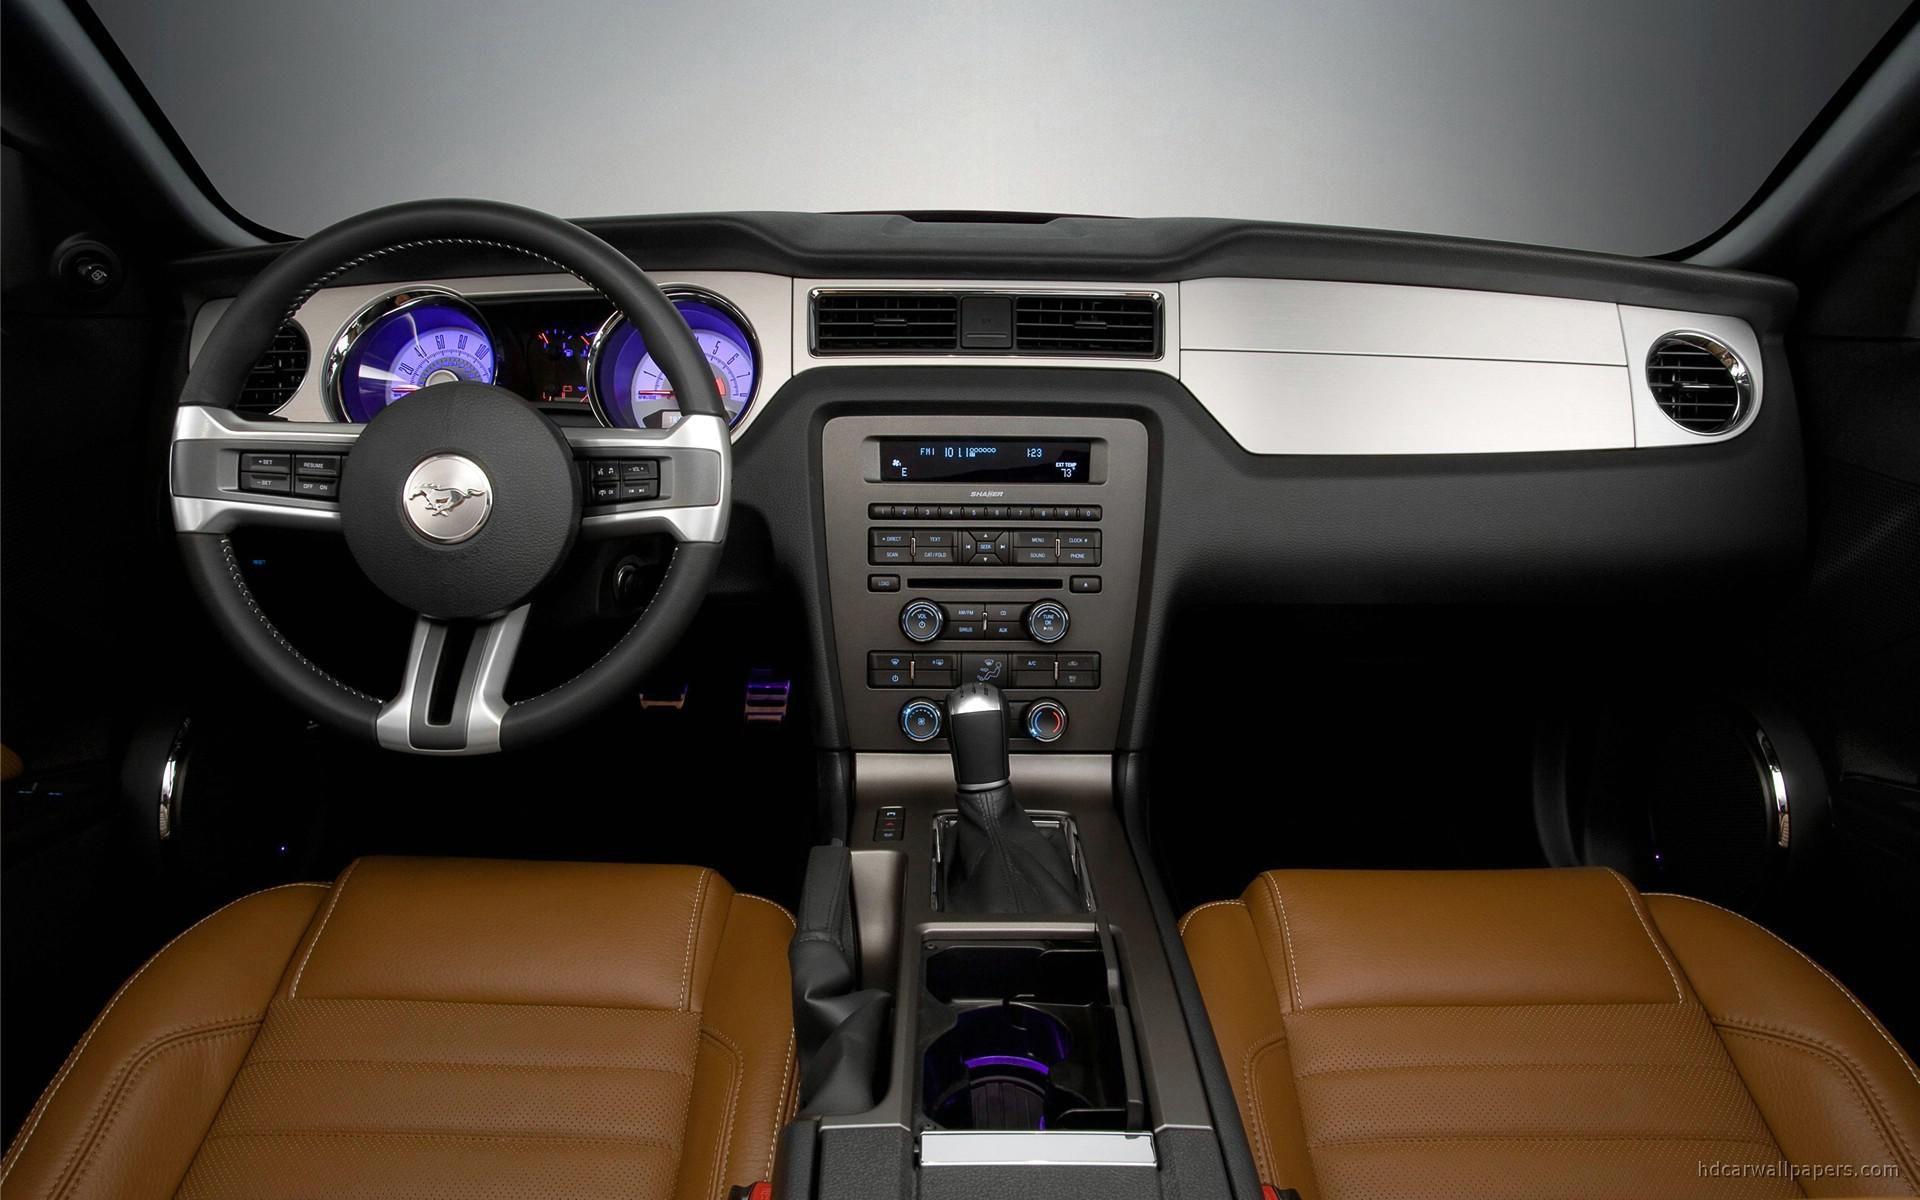 Ford Mustang 2010 Mustang Interior 2010 Mustang 2010 Ford Mustang